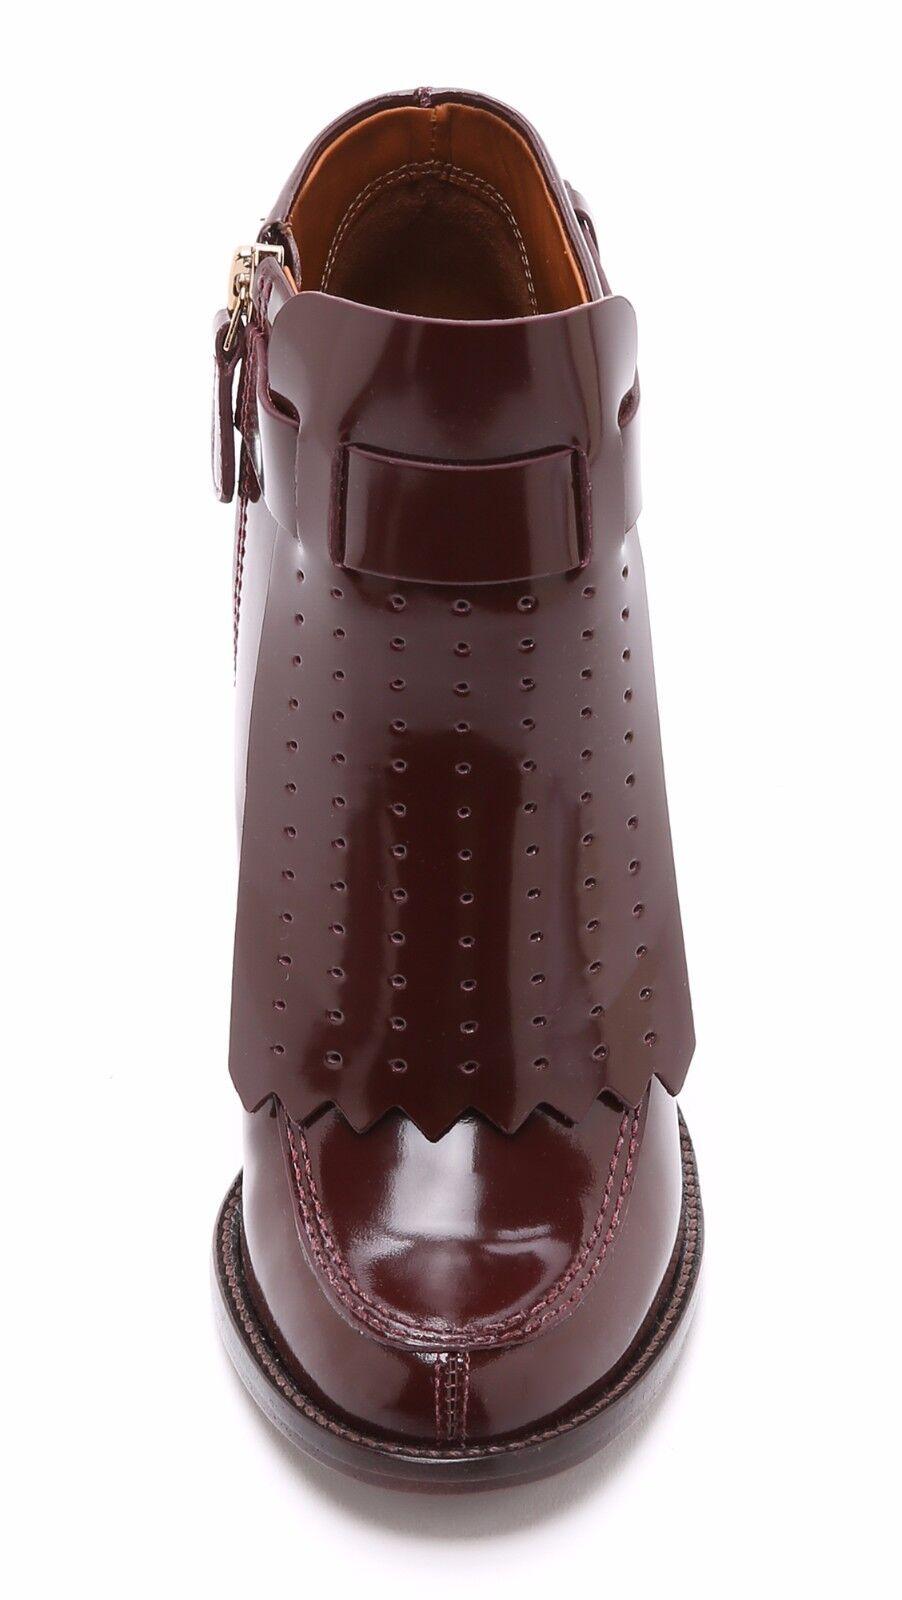 $425 Hyde New TORY BURCH Burgundy Borscht Shiny  Leder Hyde $425 Stiefel Booties schuhes 9.5 c281c6